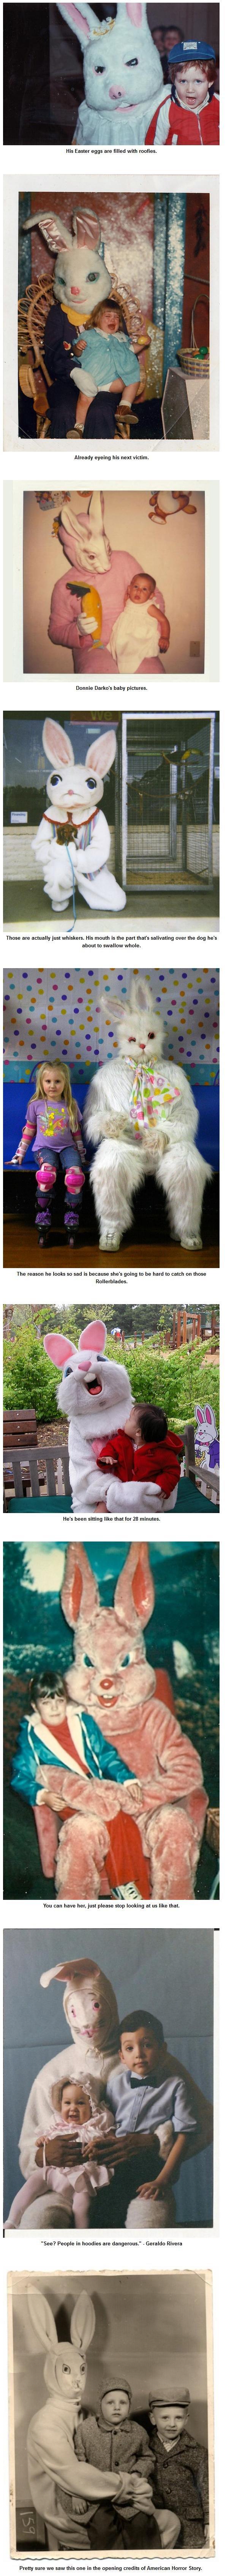 Happy Easter #4. .. mfw donnie darko